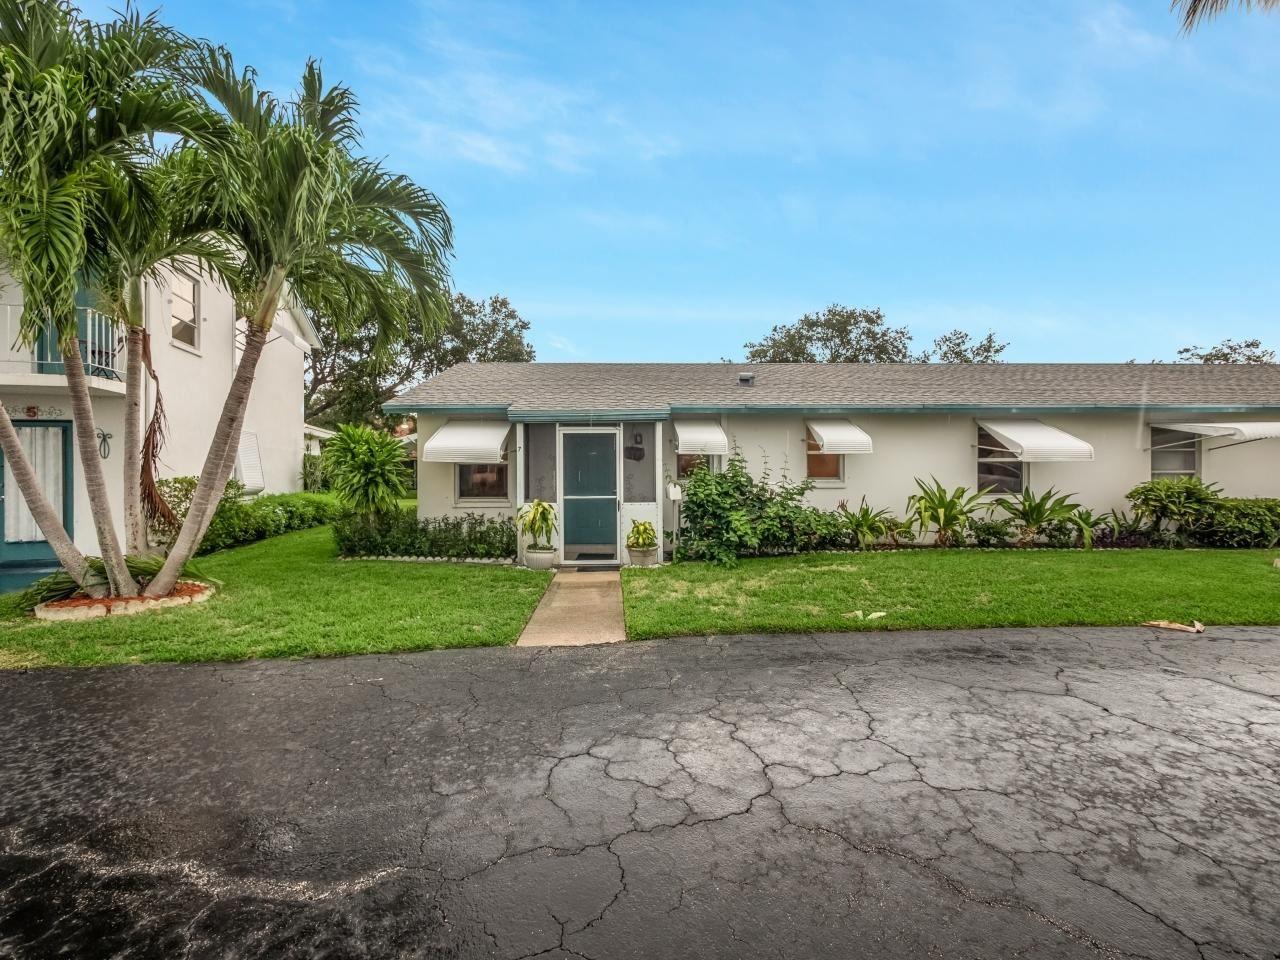 10162 N Meridian 7 Way N #7, Palm Beach Gardens, FL 33410 - MLS#: RX-10728217